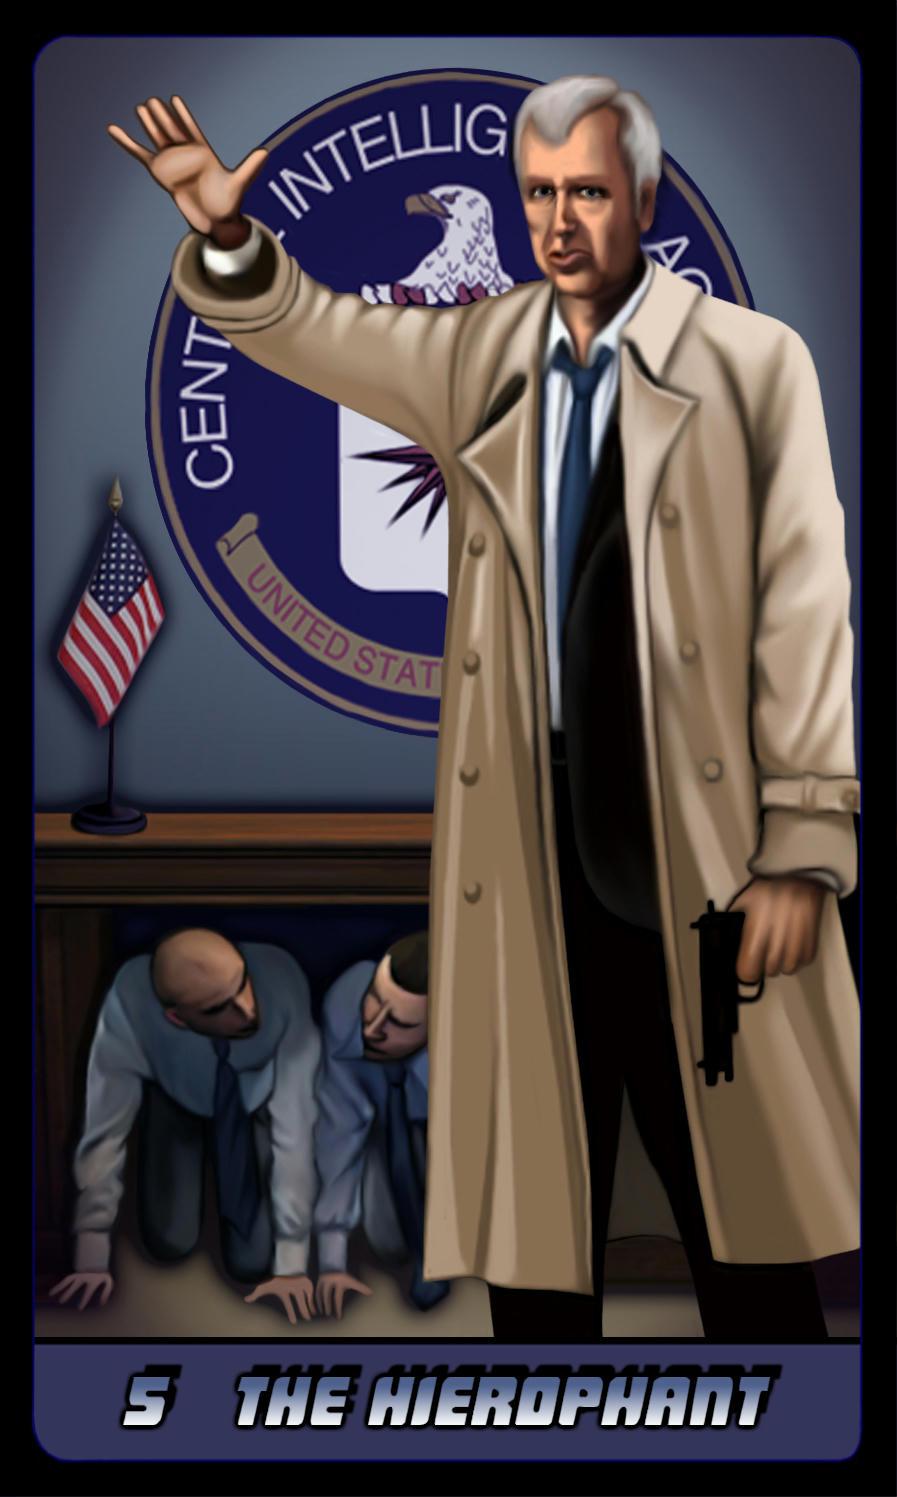 Stegler in CIA HQ, logo behind him, minions cowering under desk